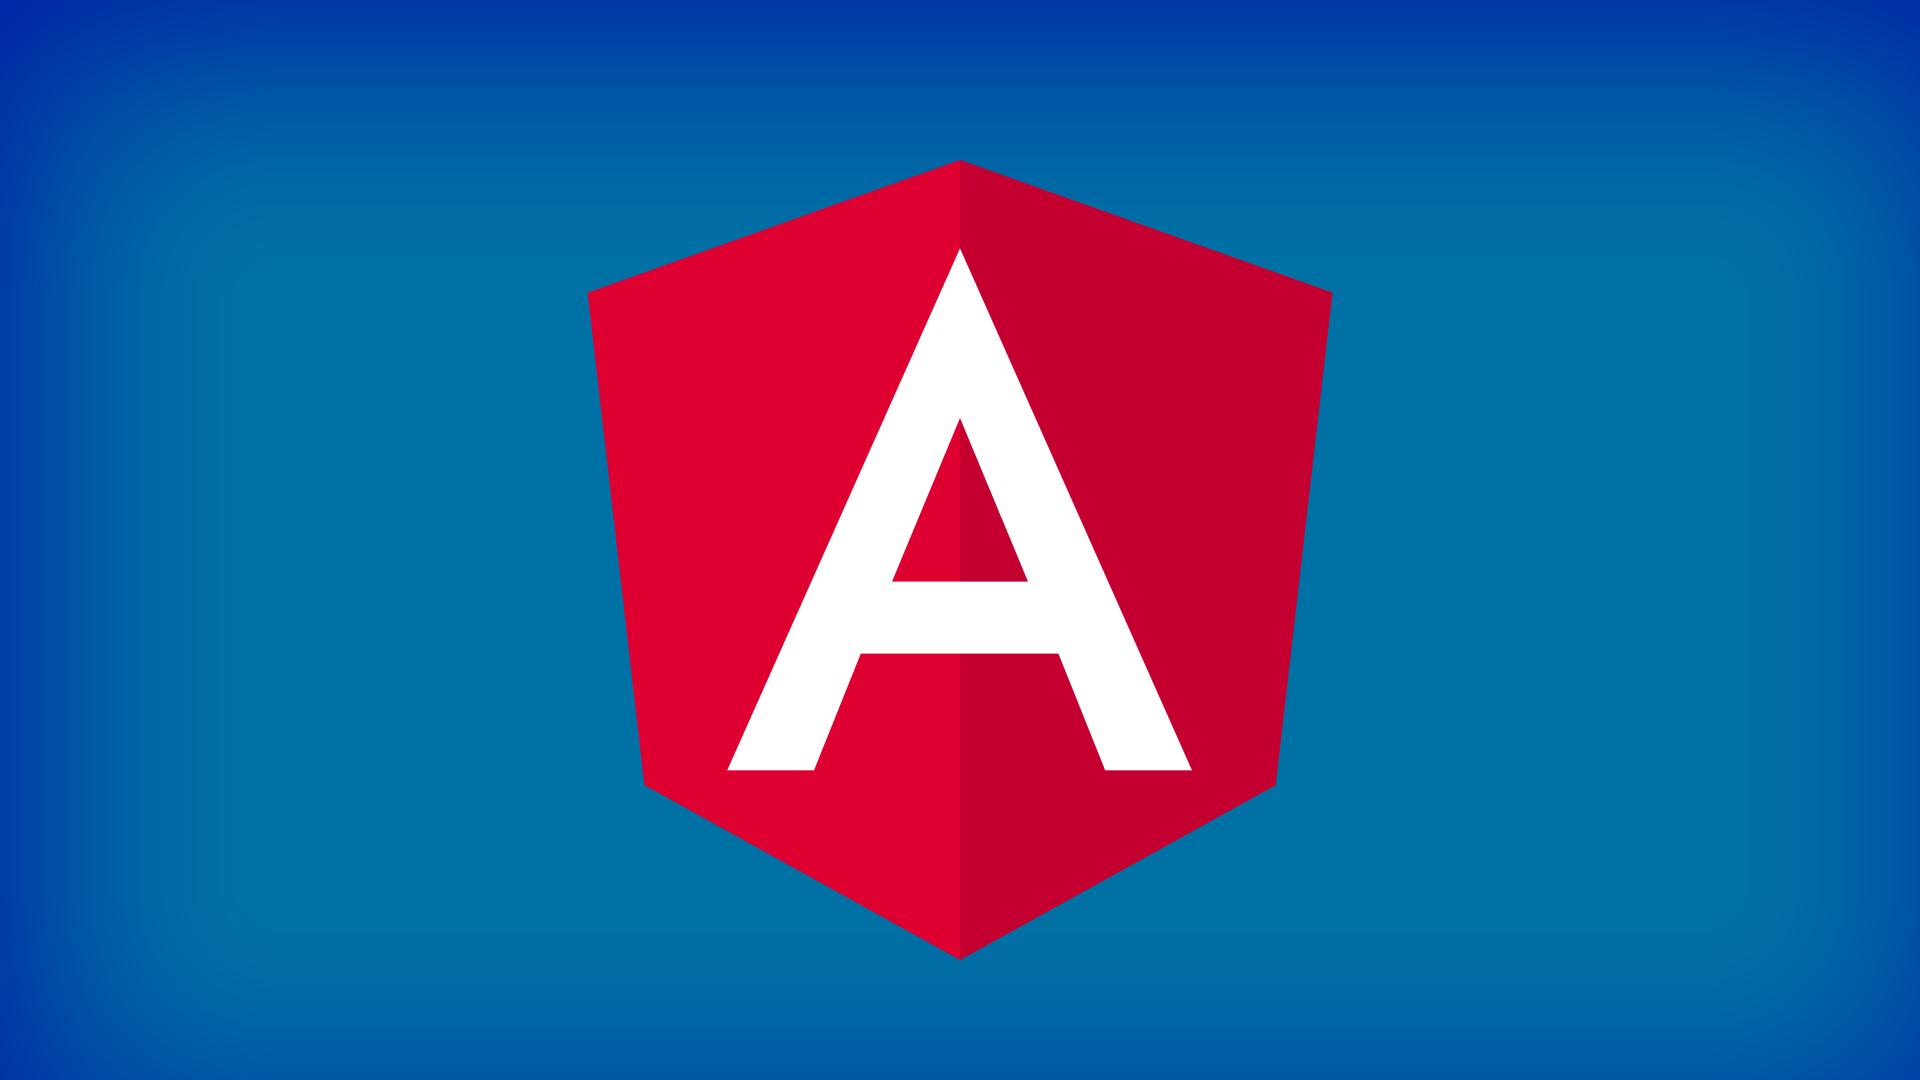 Wallpaper AngularJS logo